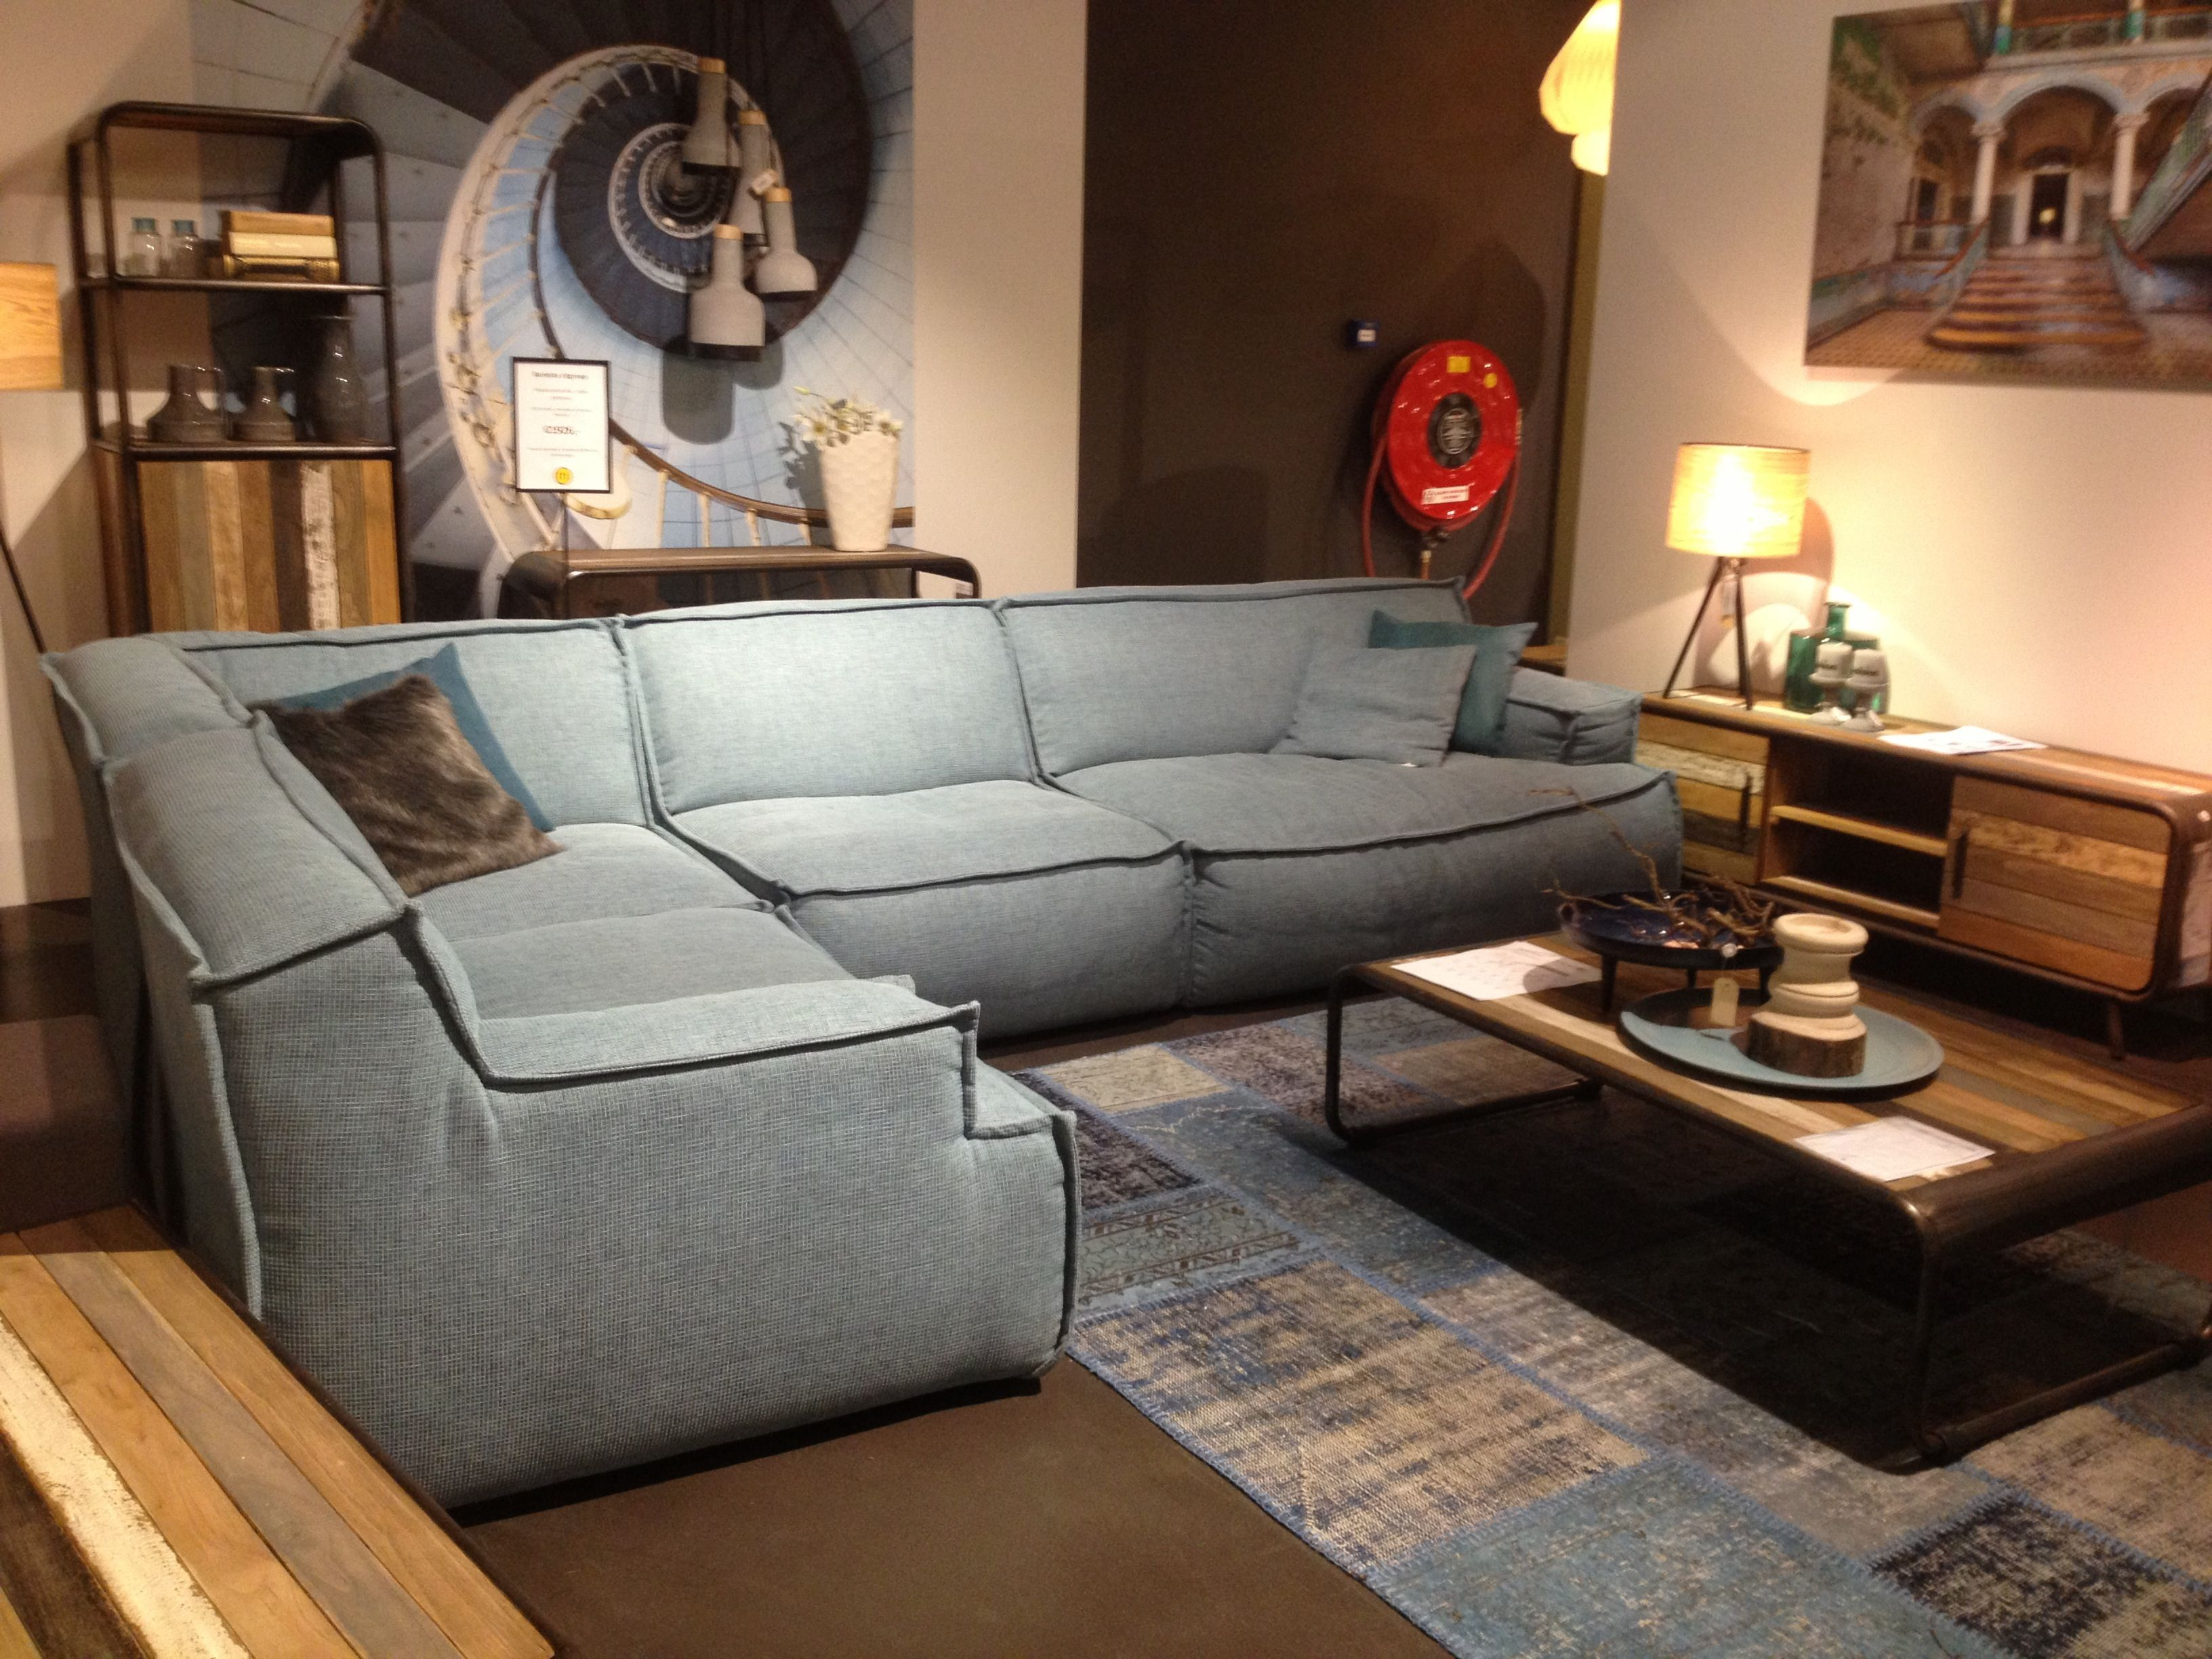 barletta sofa bed overstock trendhopper breda bank